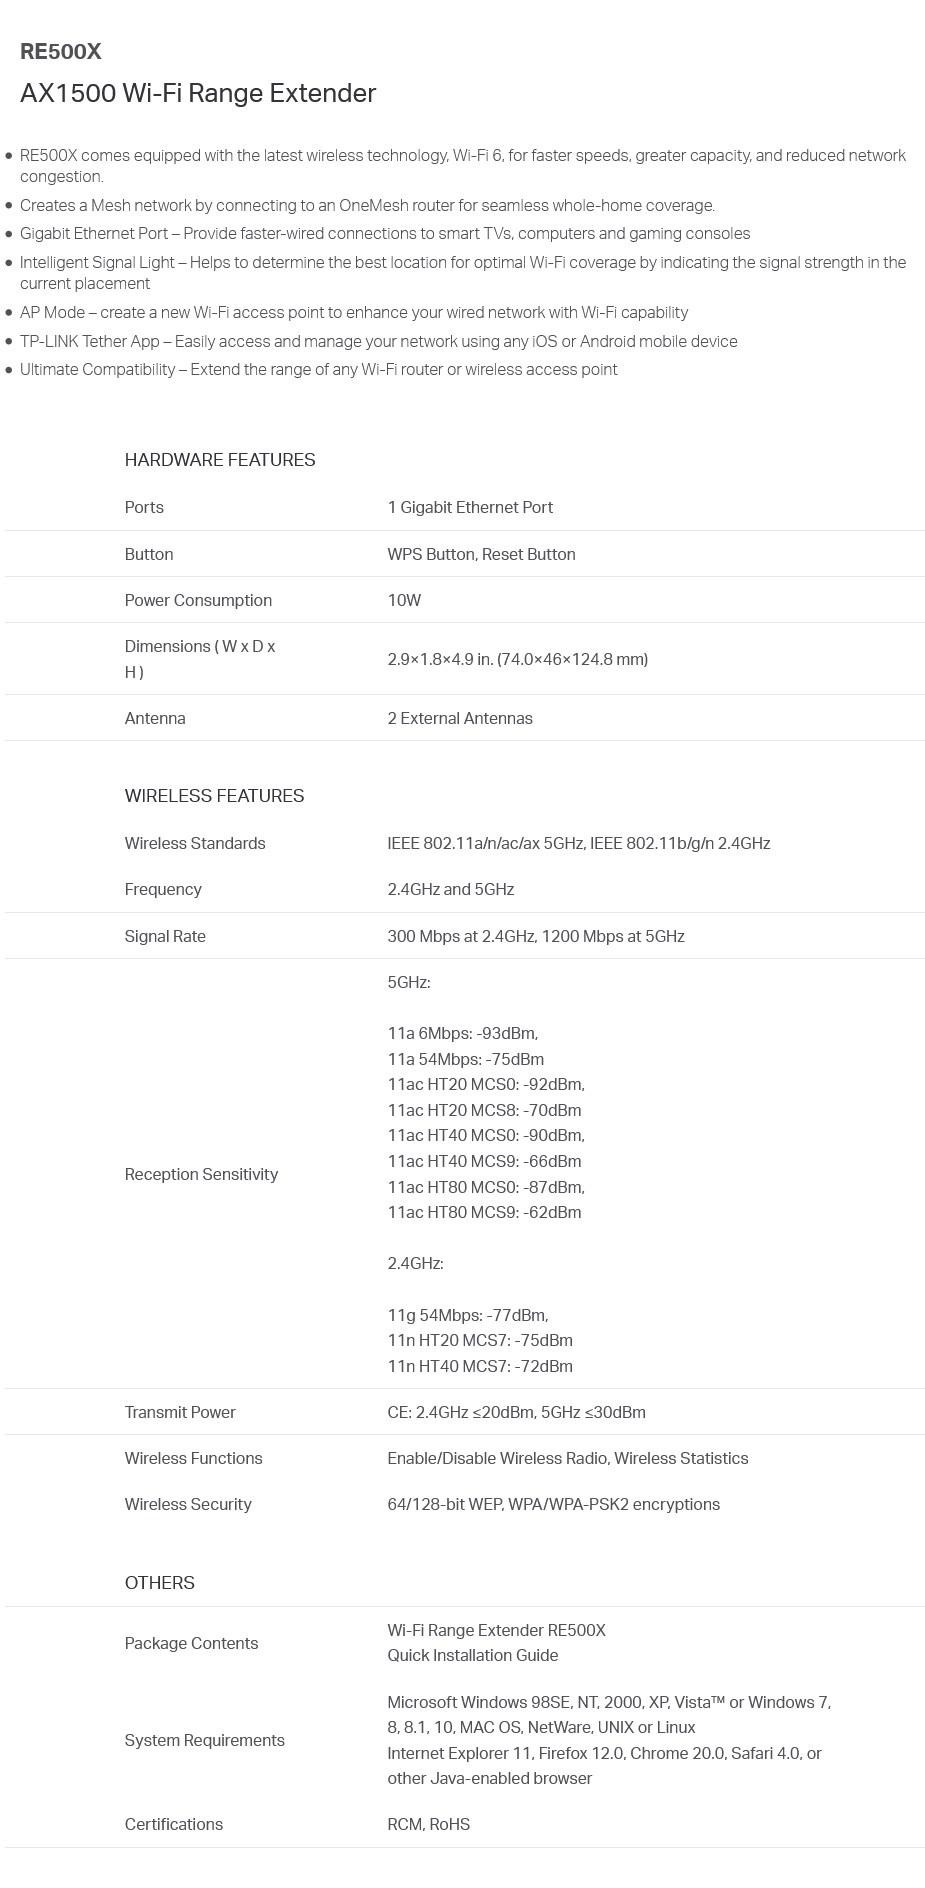 tplink-re500x-ax1500-wifi-range-extender-ac43831-3.jpg